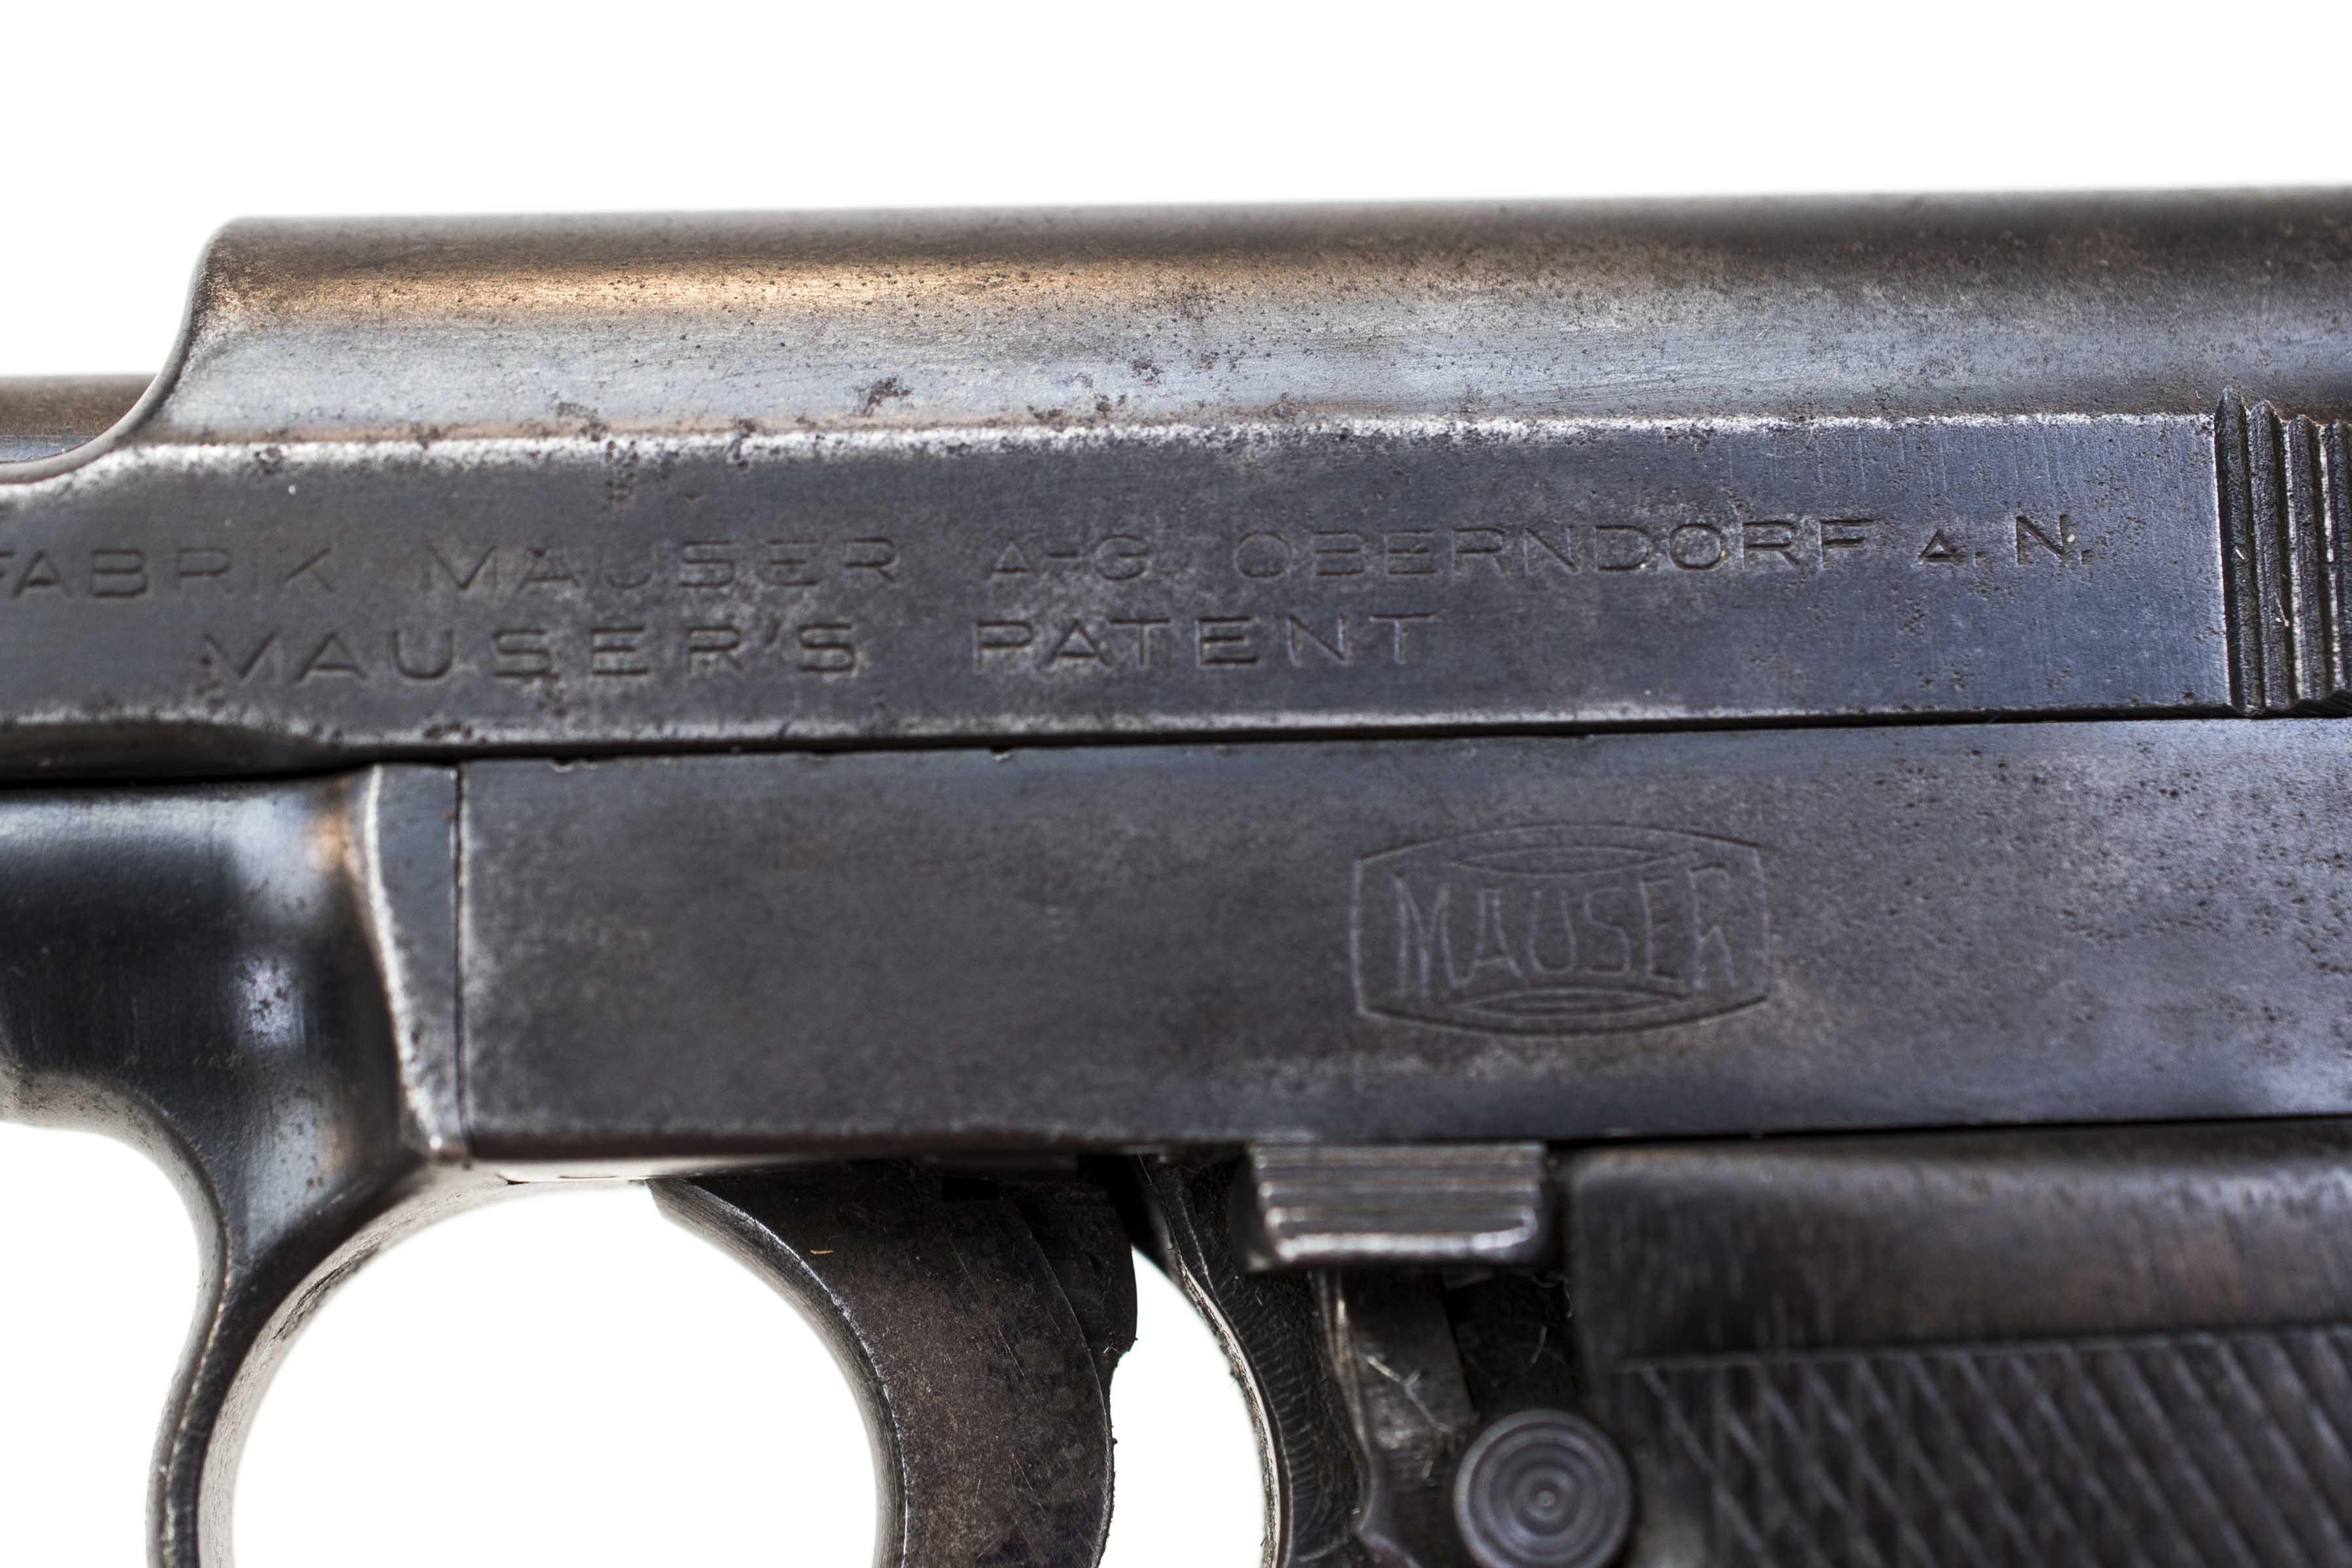 MAUSER POCKET PISTOL MODEL 1914 (Auction ID: 5213294, End